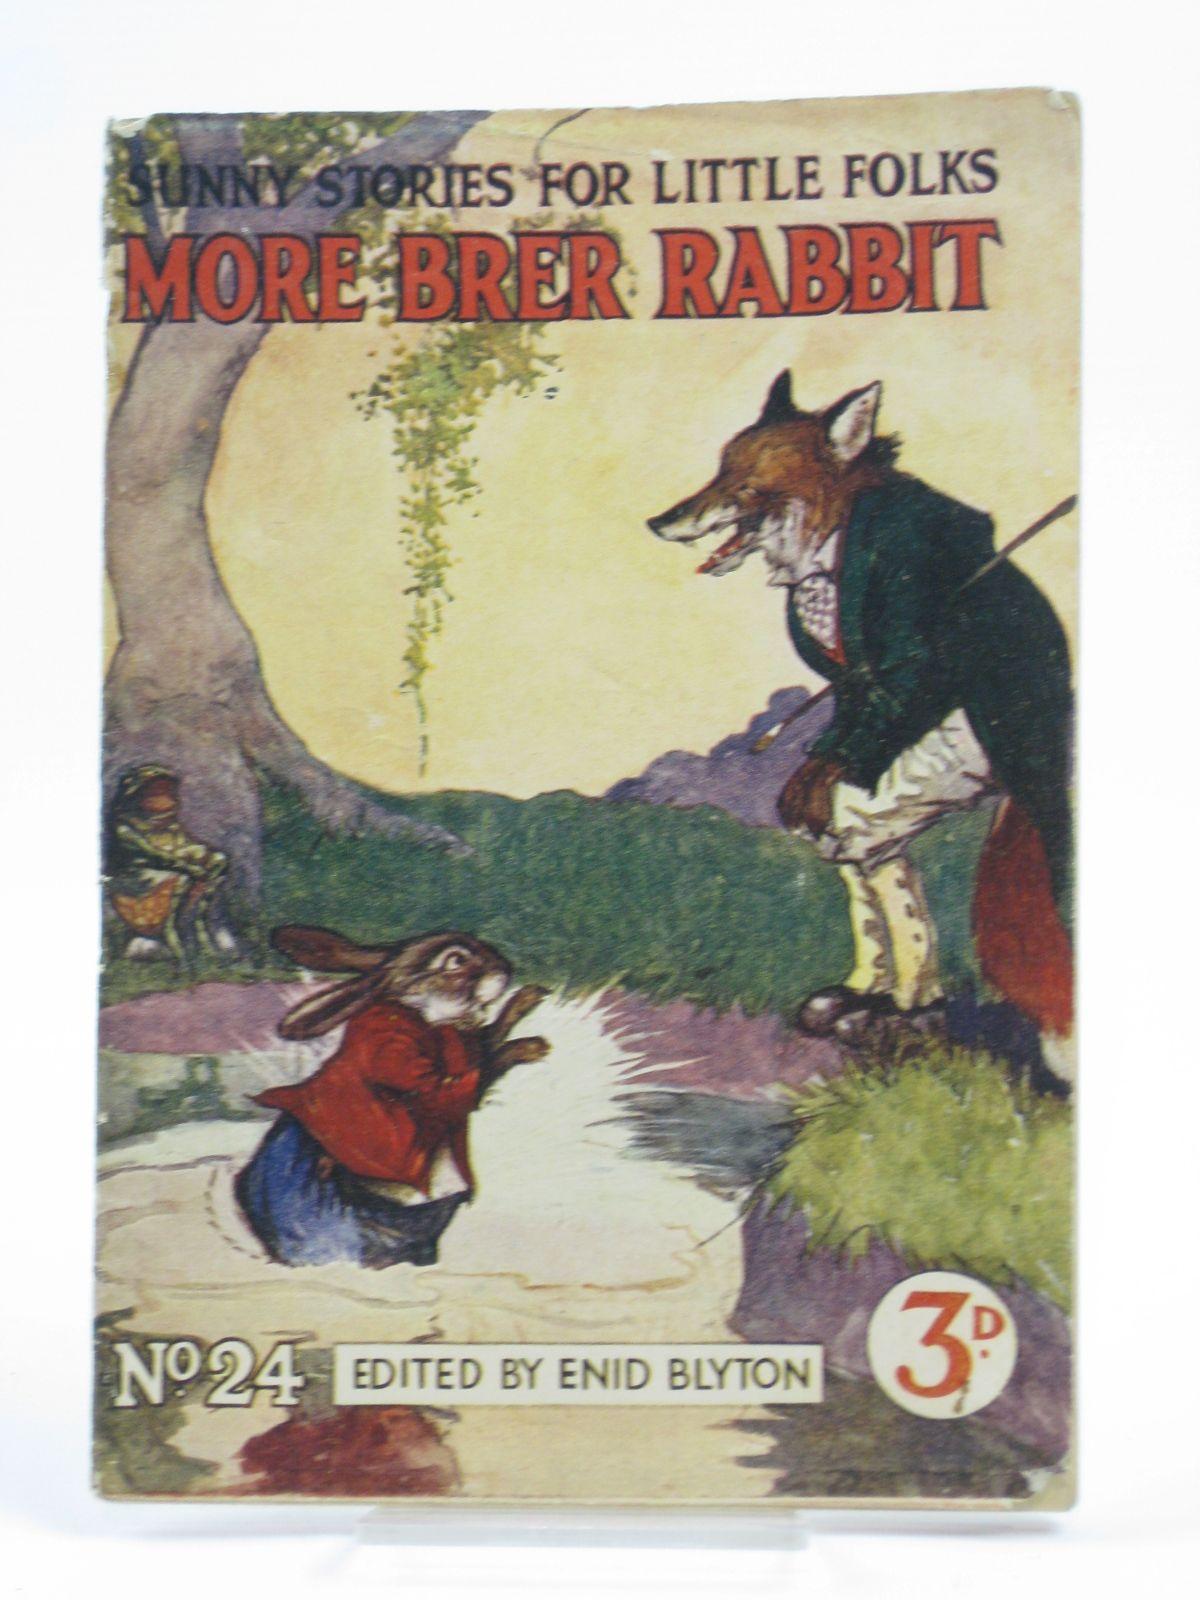 Photo of SUNNY STORIES FOR LITTLE FOLKS No. 24 MORE BRER RABBIT